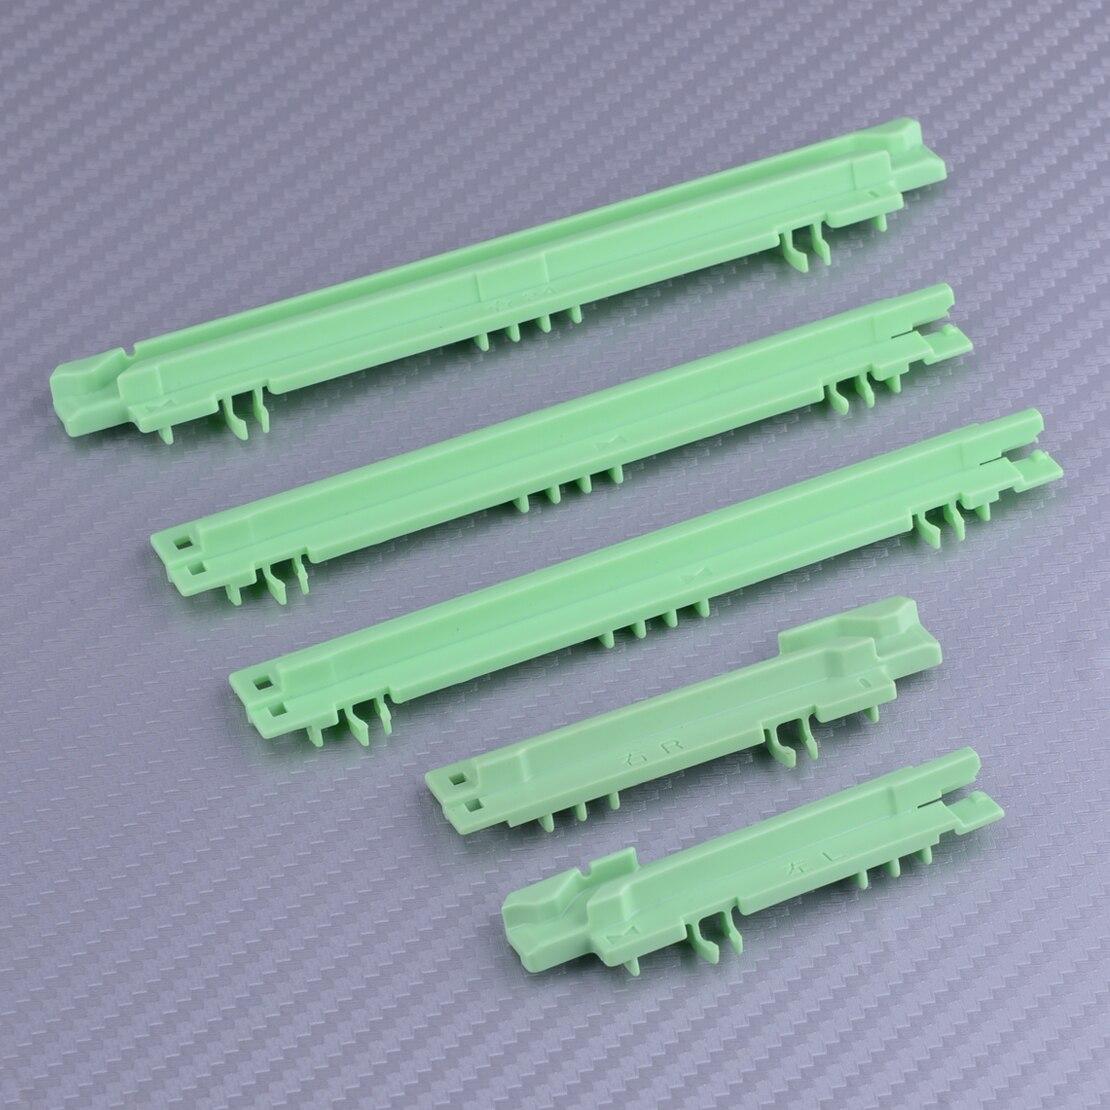 LETAOSK 410985002 410976002 Single Motif Knitting Cam Spare Parts Fit For Brother Machine KH864 KH881 KH890 KH891